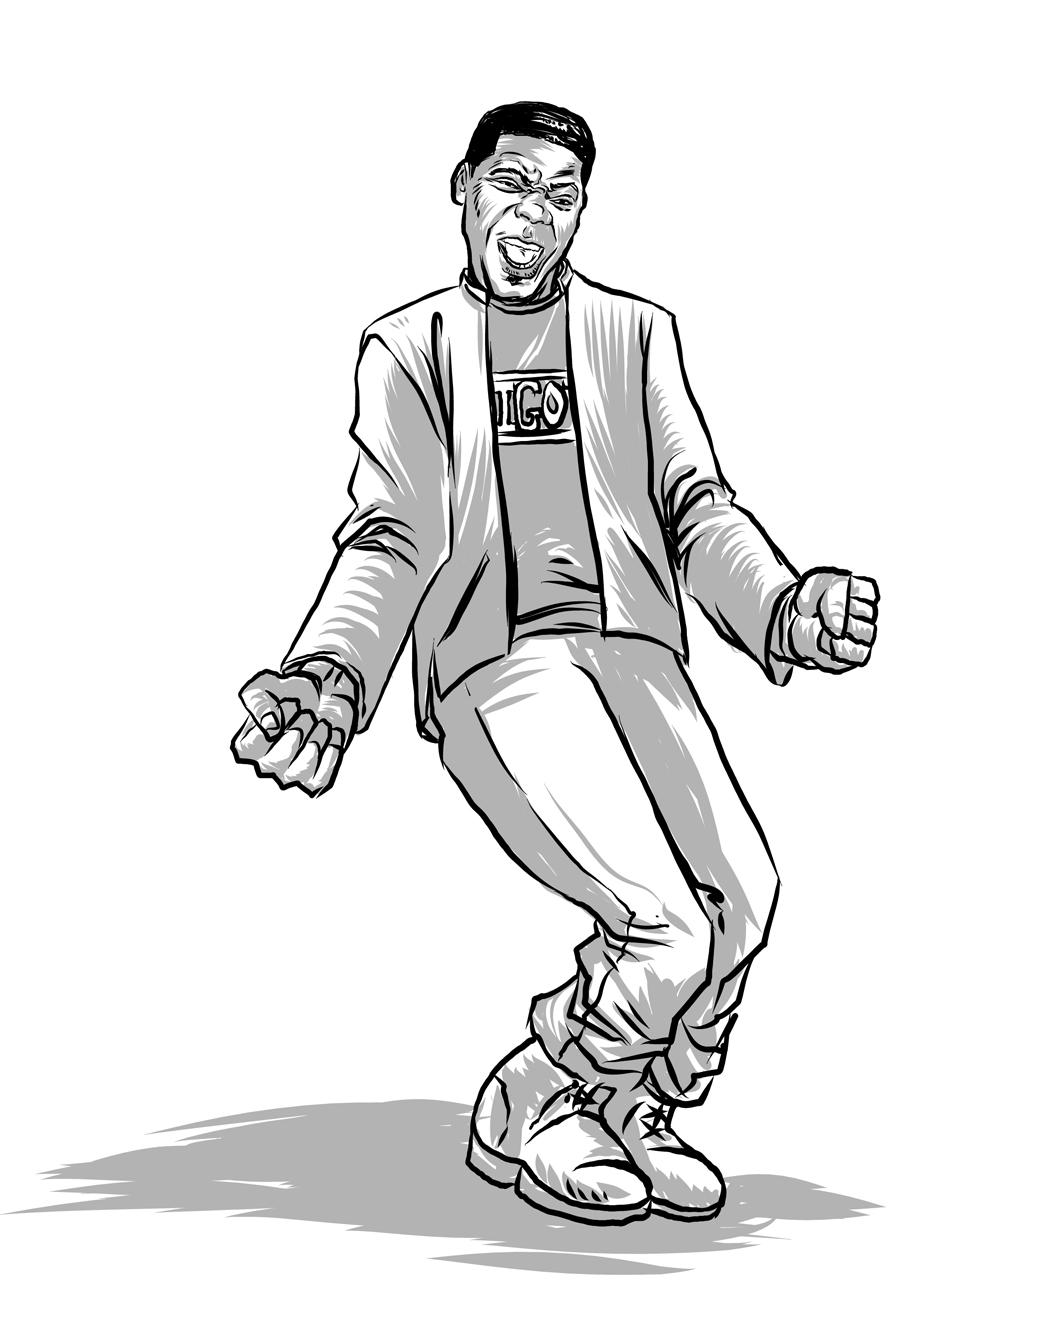 michael jordan coloring pages free - photo #29